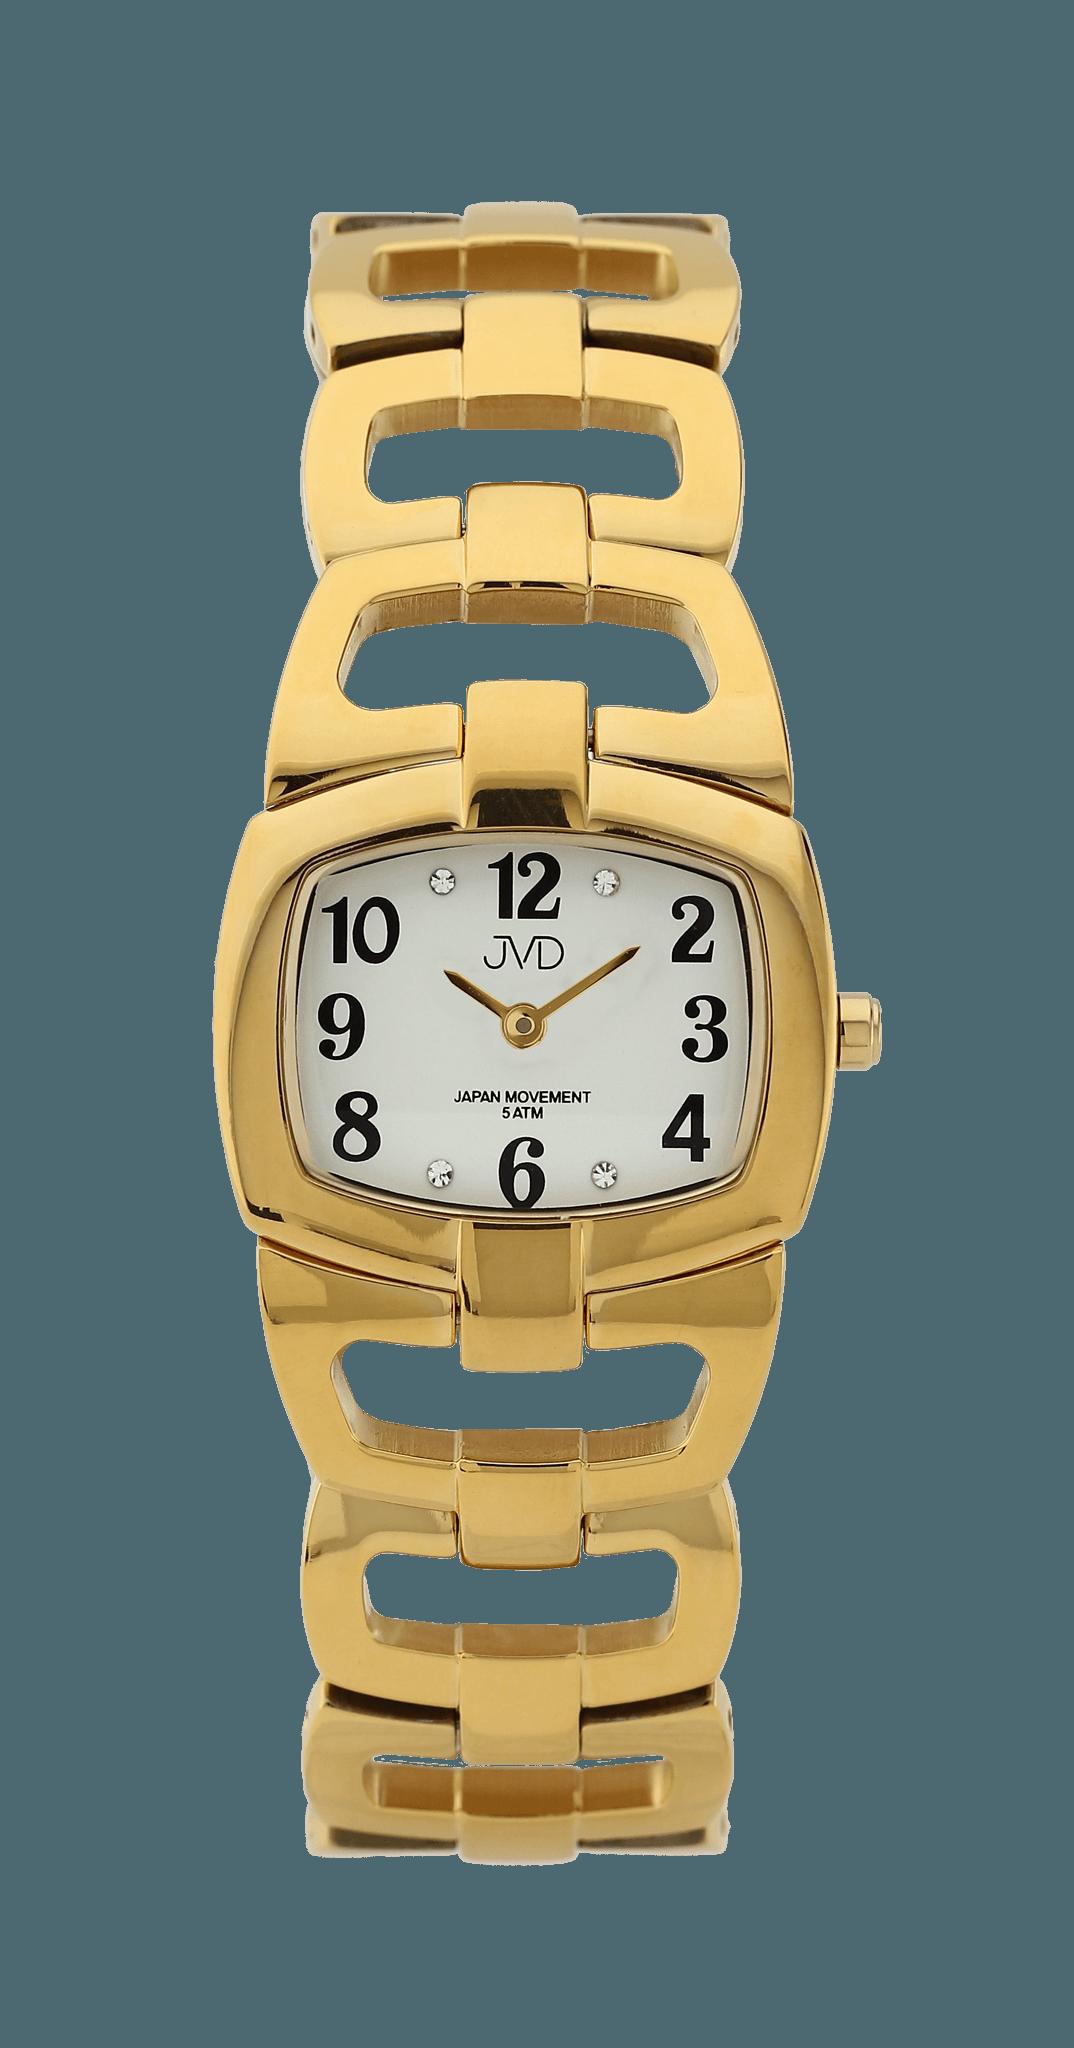 Náramkové hodinky JVD titanium J5003.5 - sk  c8030e0bcd7